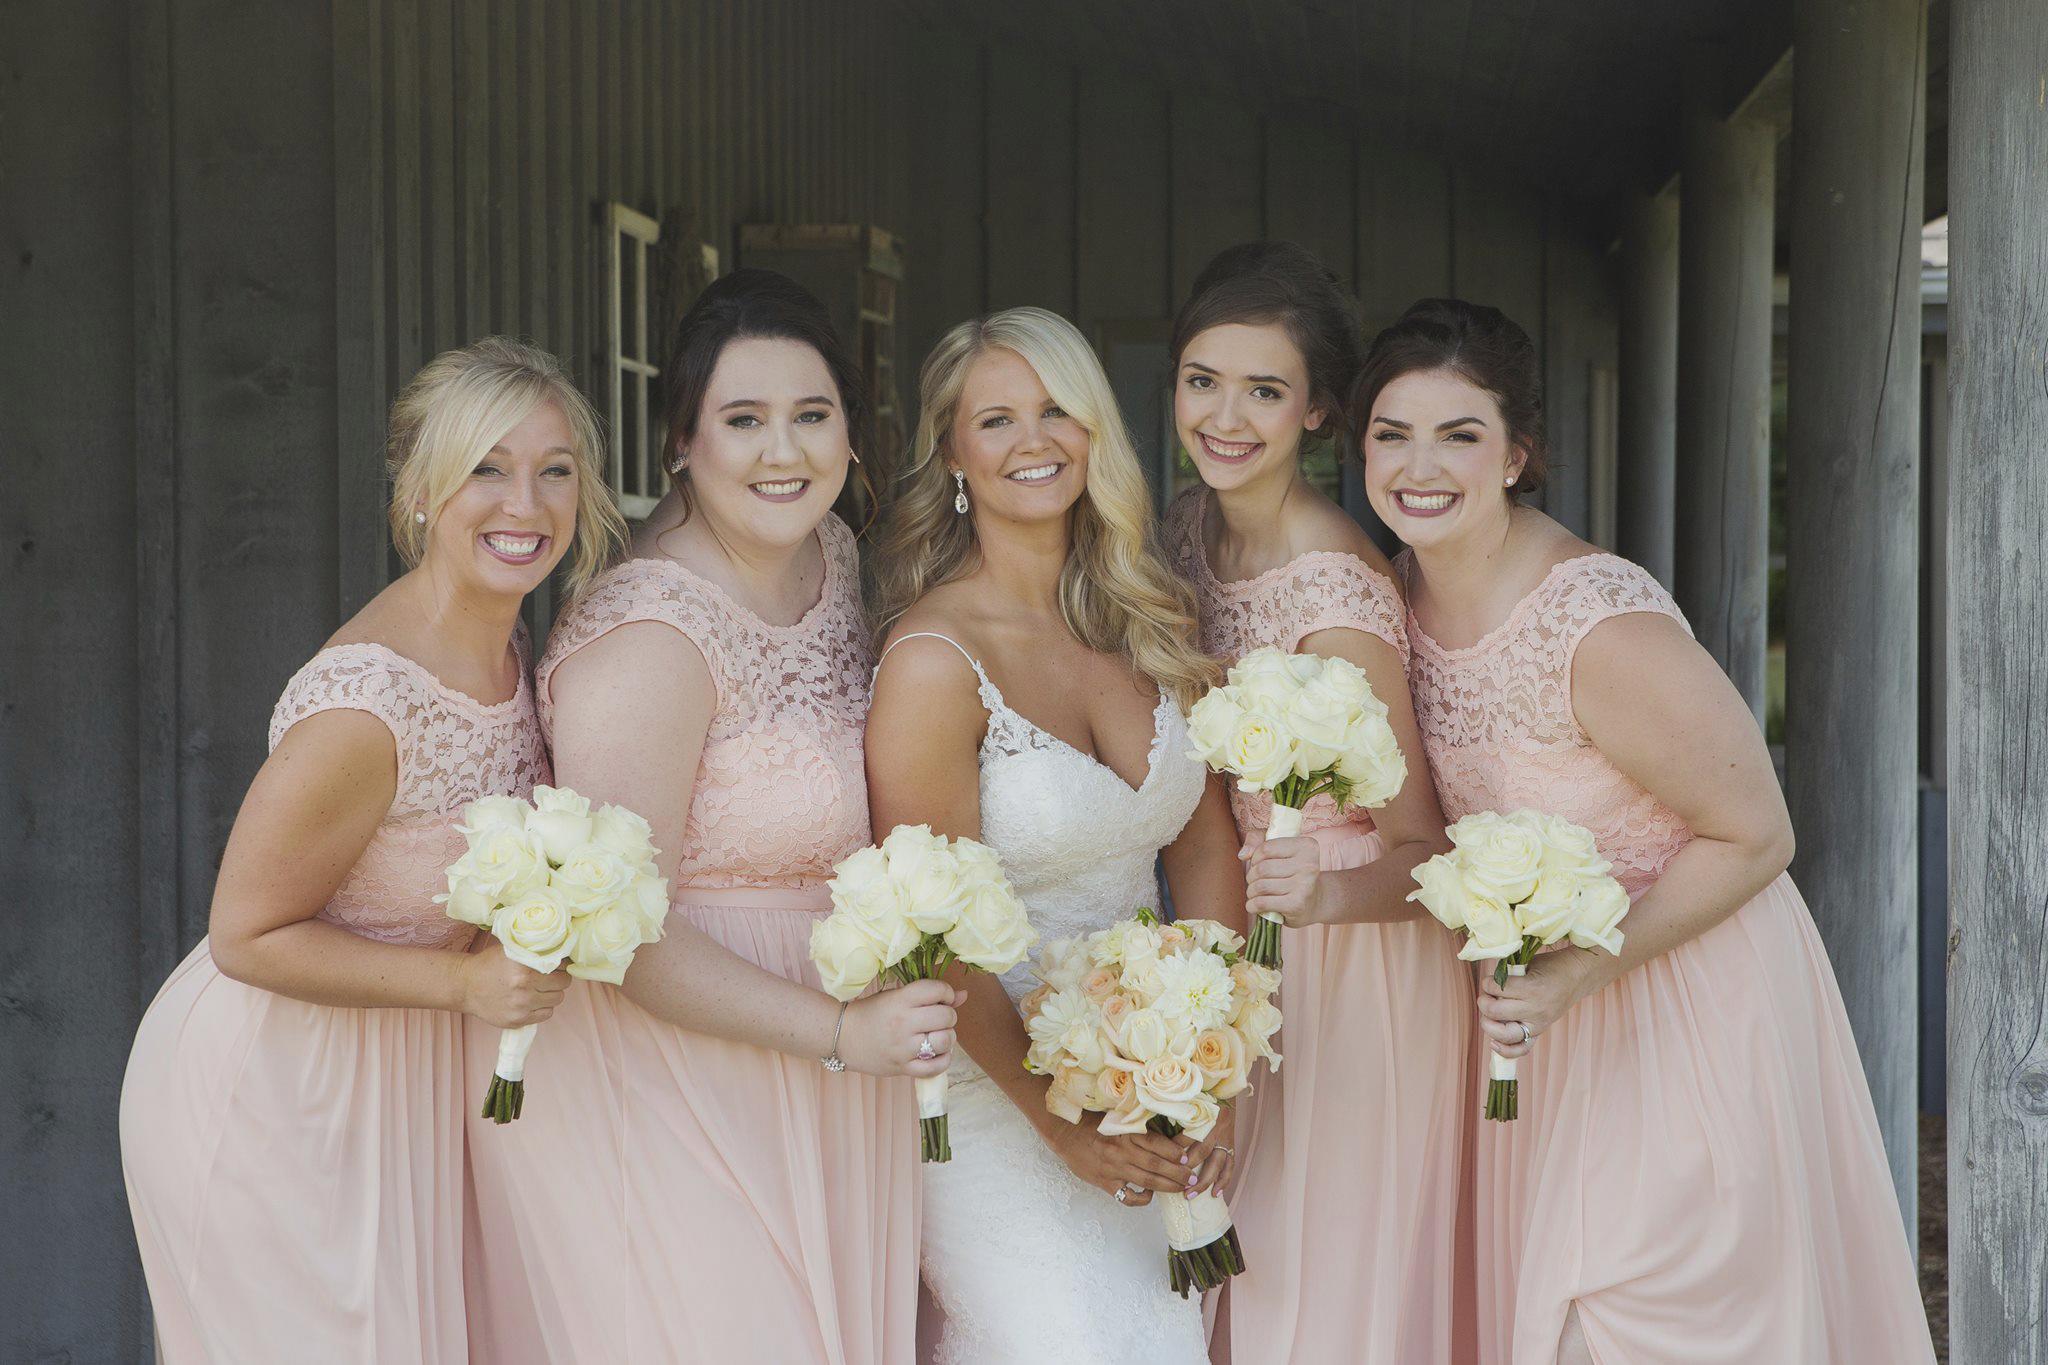 bride10.png